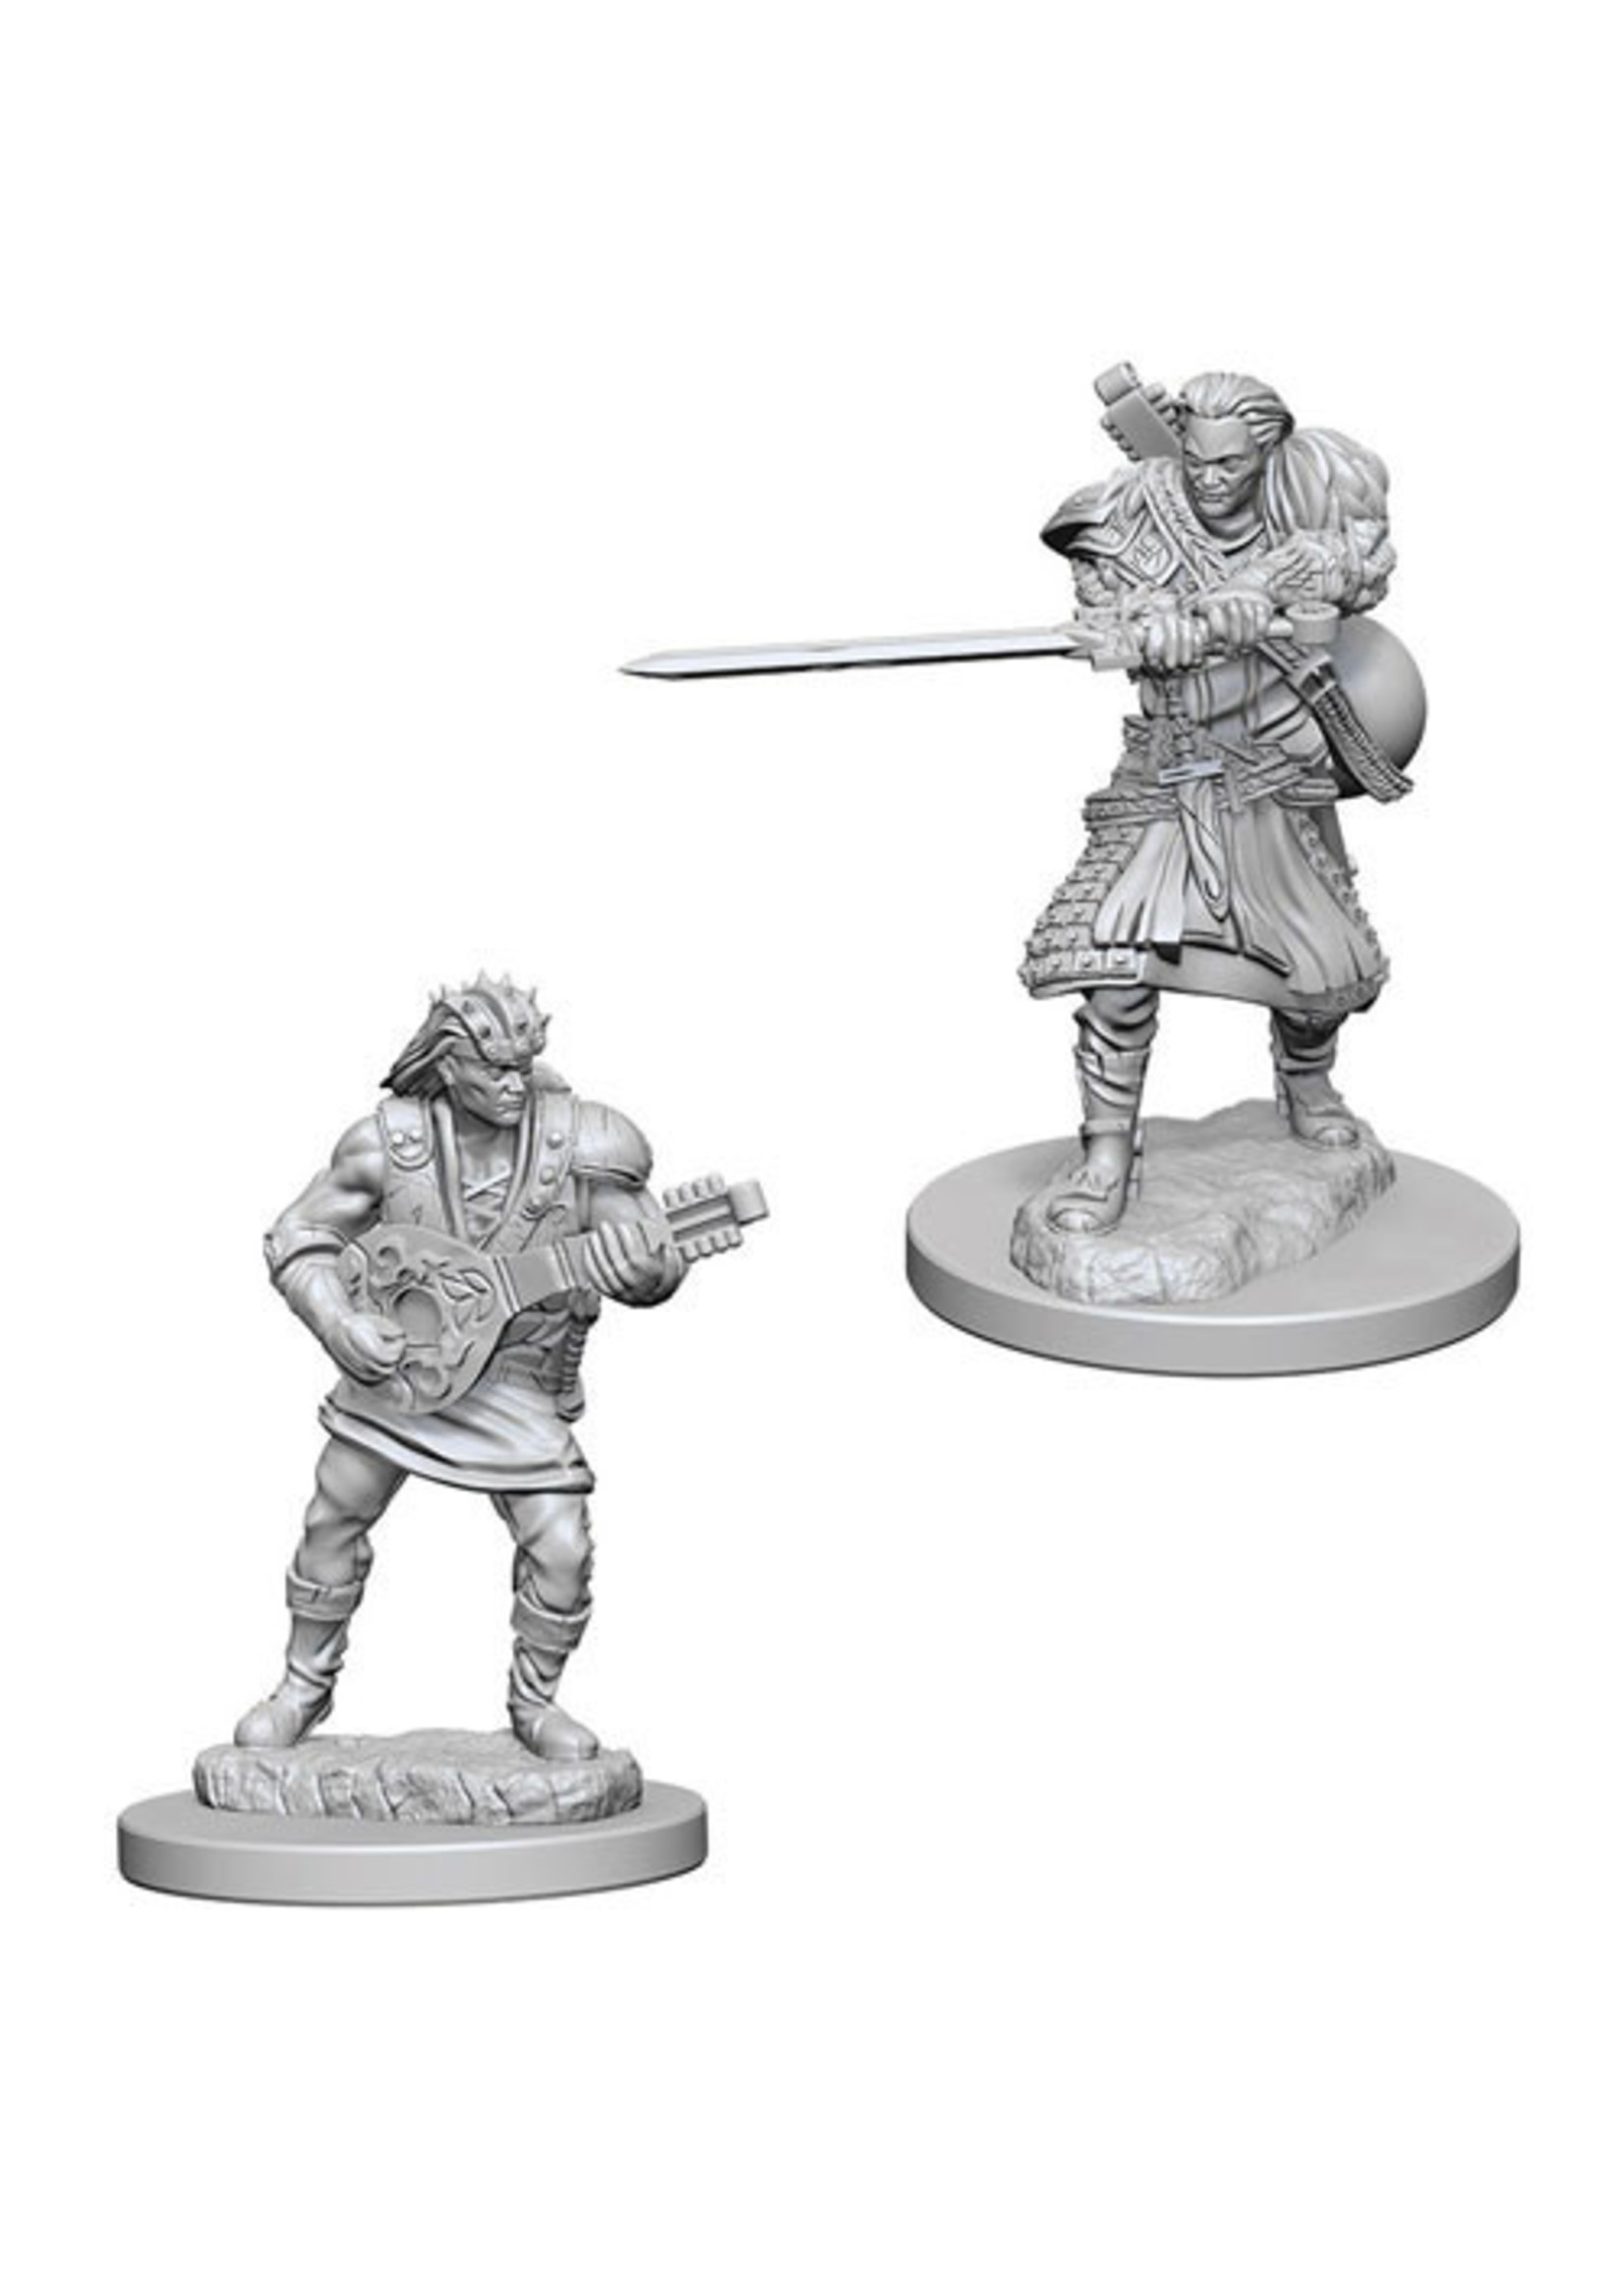 Dungeons & Dragons Nolzur`s Marvelous Unpainted Miniatures: W4 Human Male Bard